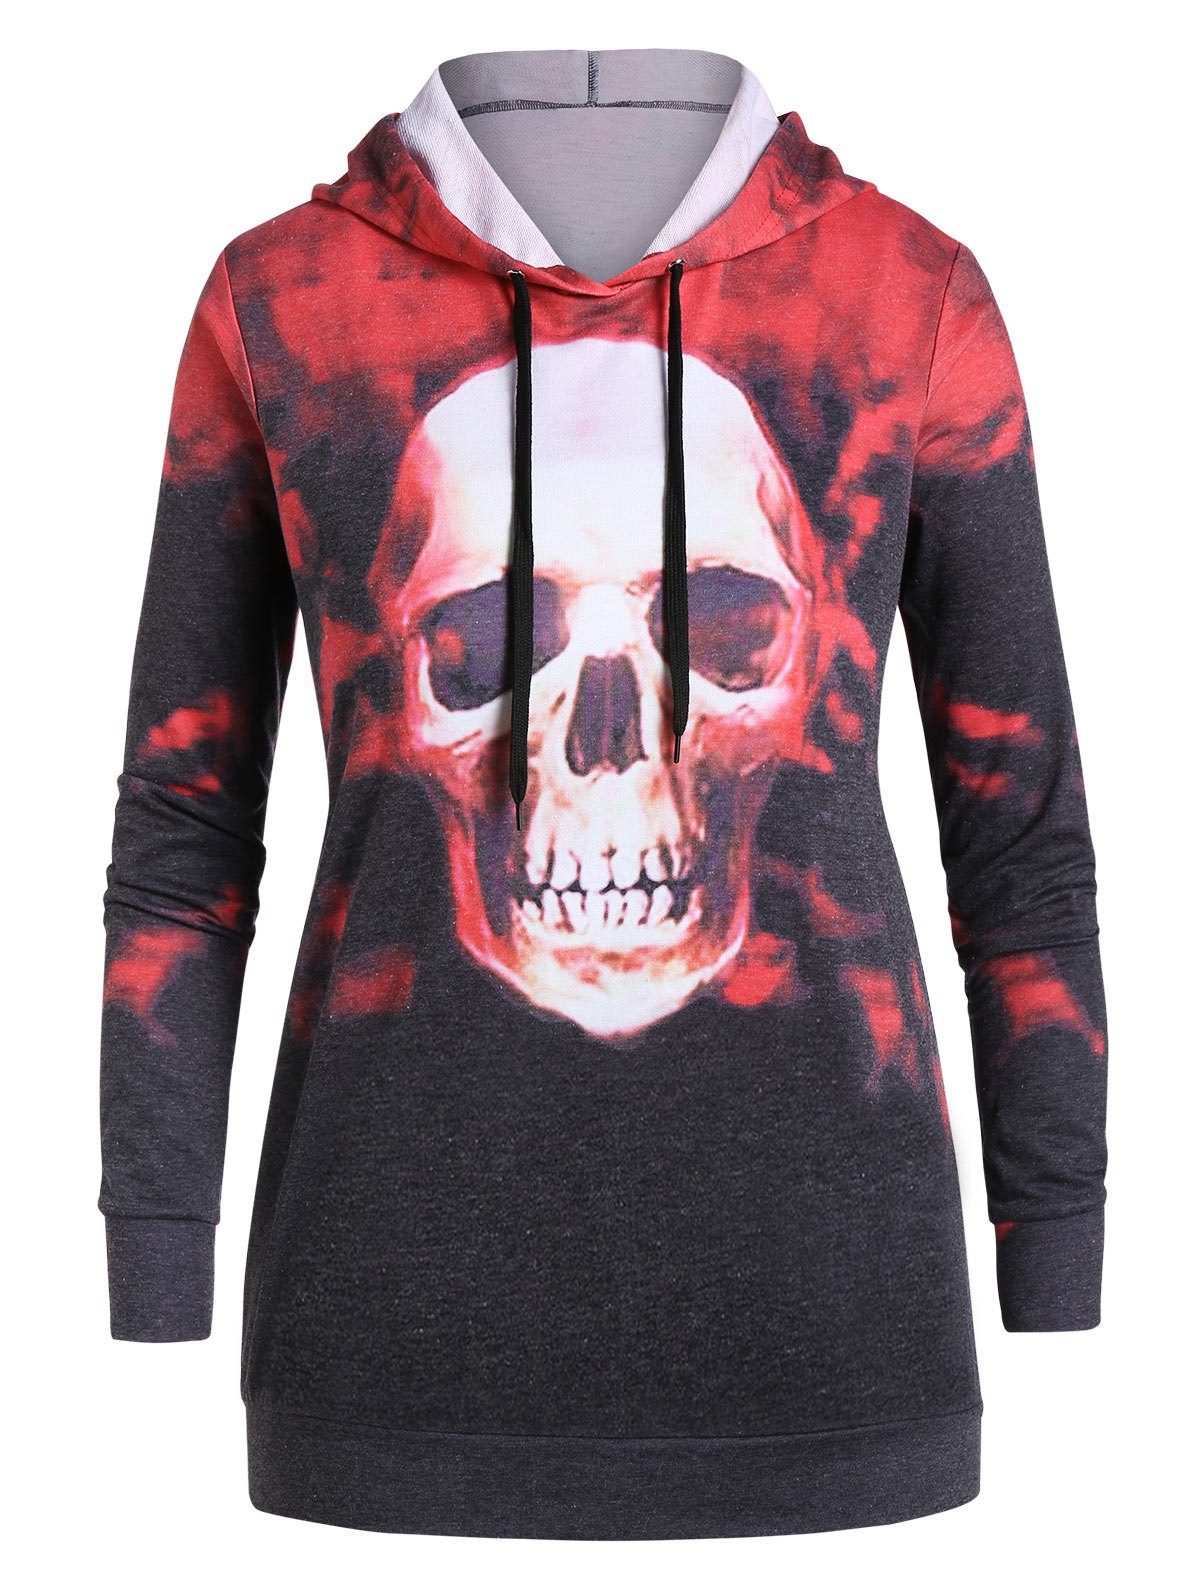 Plus Size Tunic Tie Dye Skull Print Hoodie